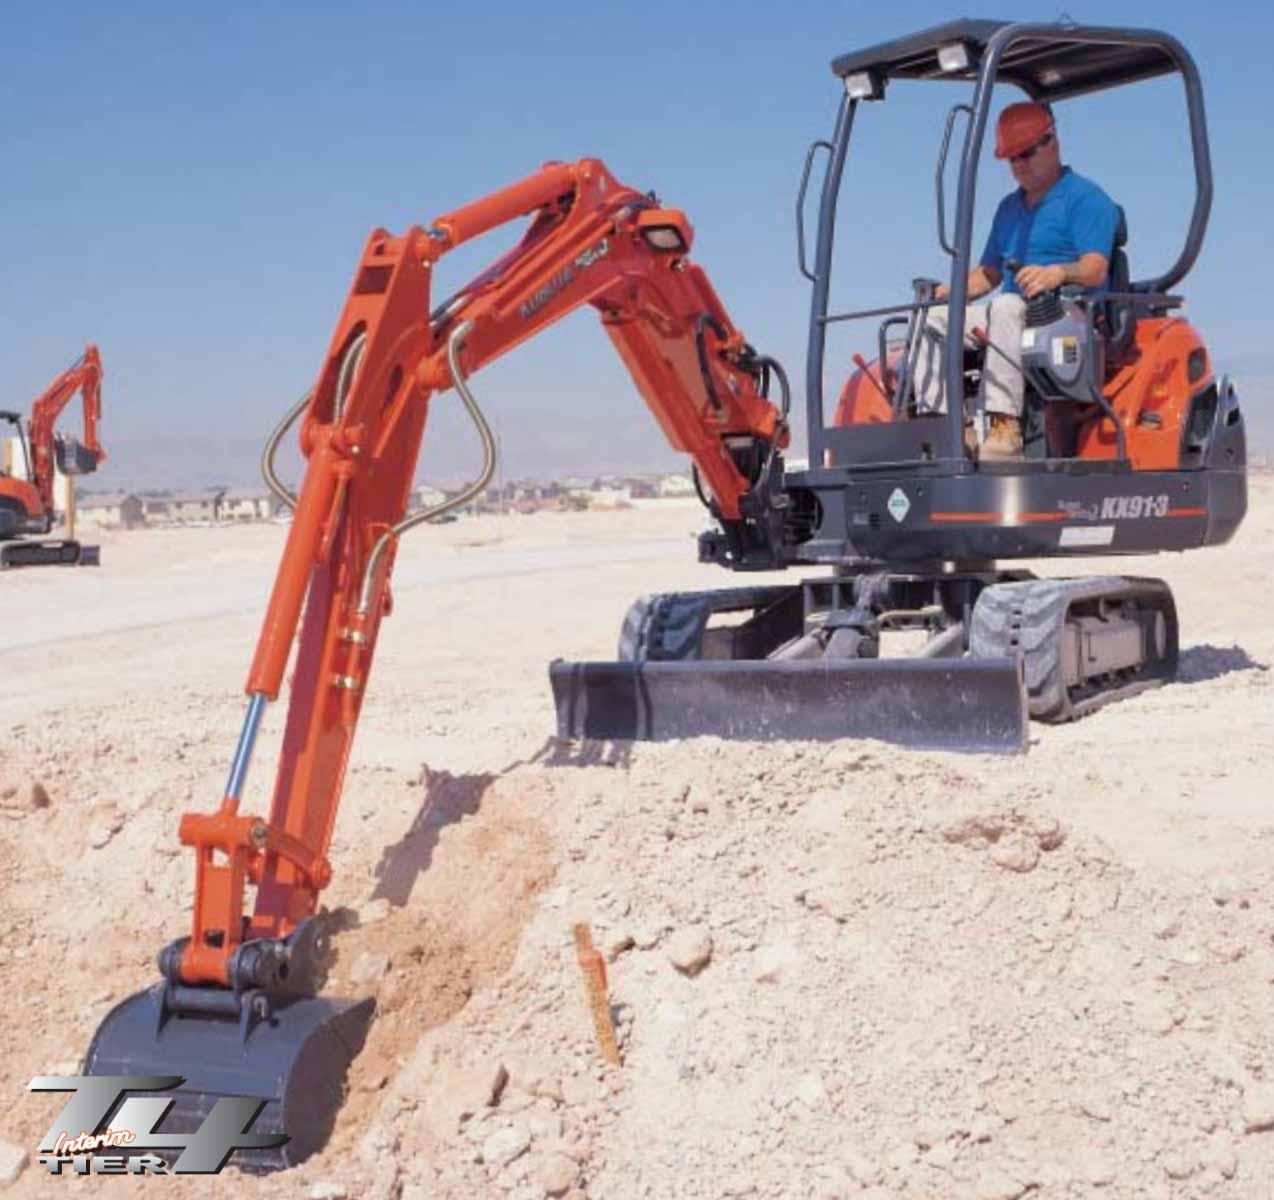 Kubota KX91-3HGLS2 Canopy Excavator 3.2 Ton